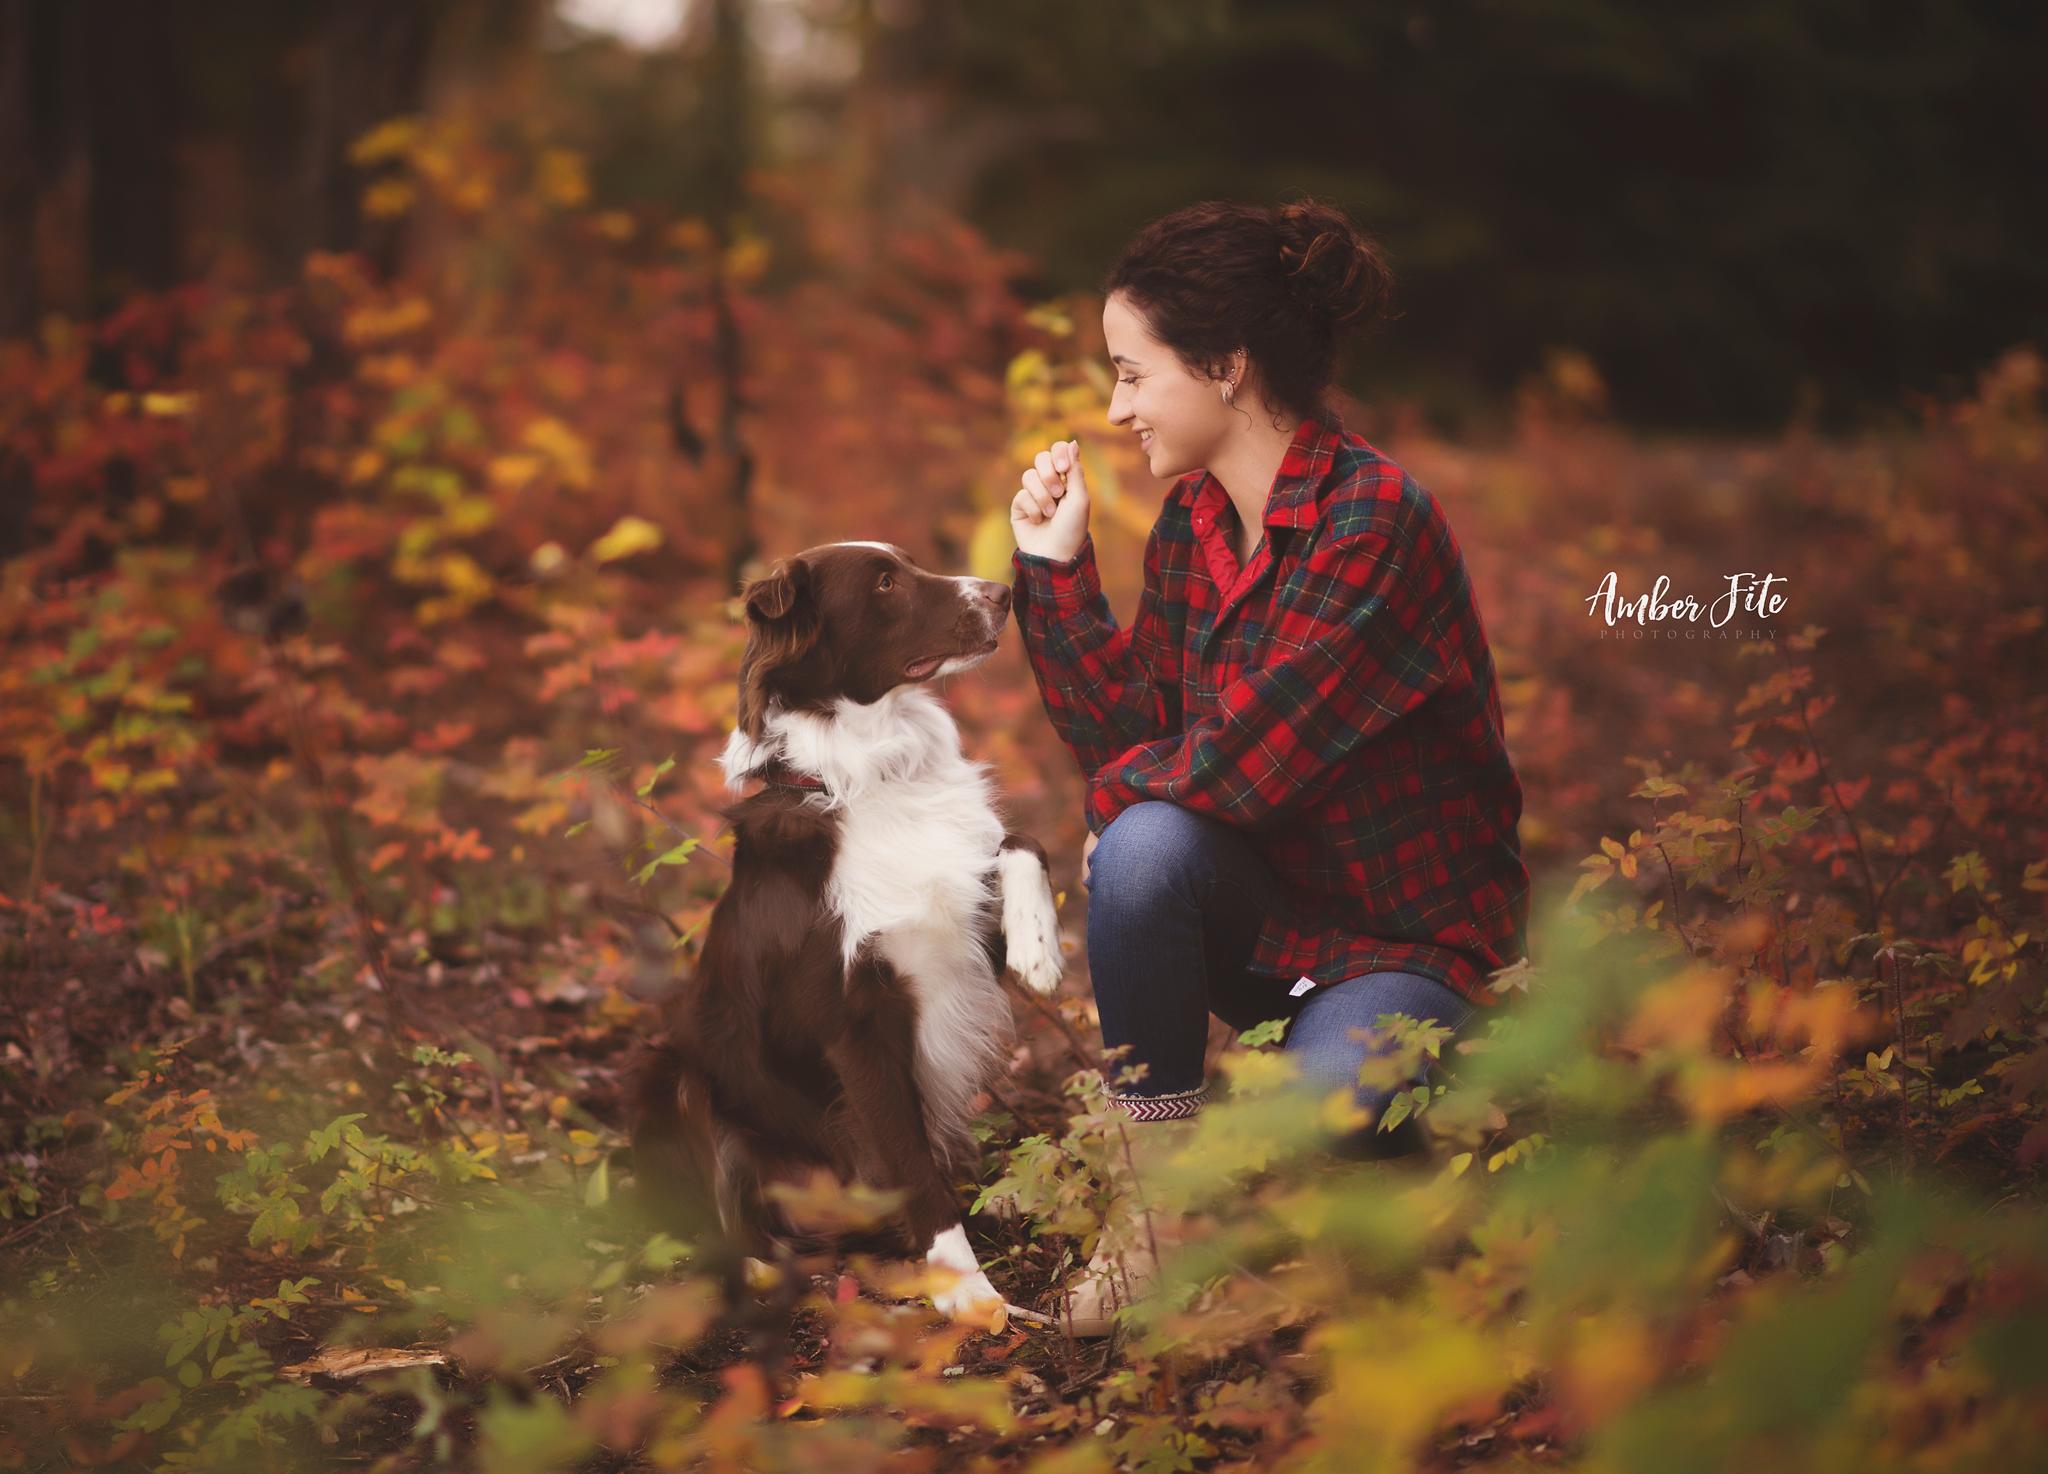 Amber Fite Photography - Senior Portraits